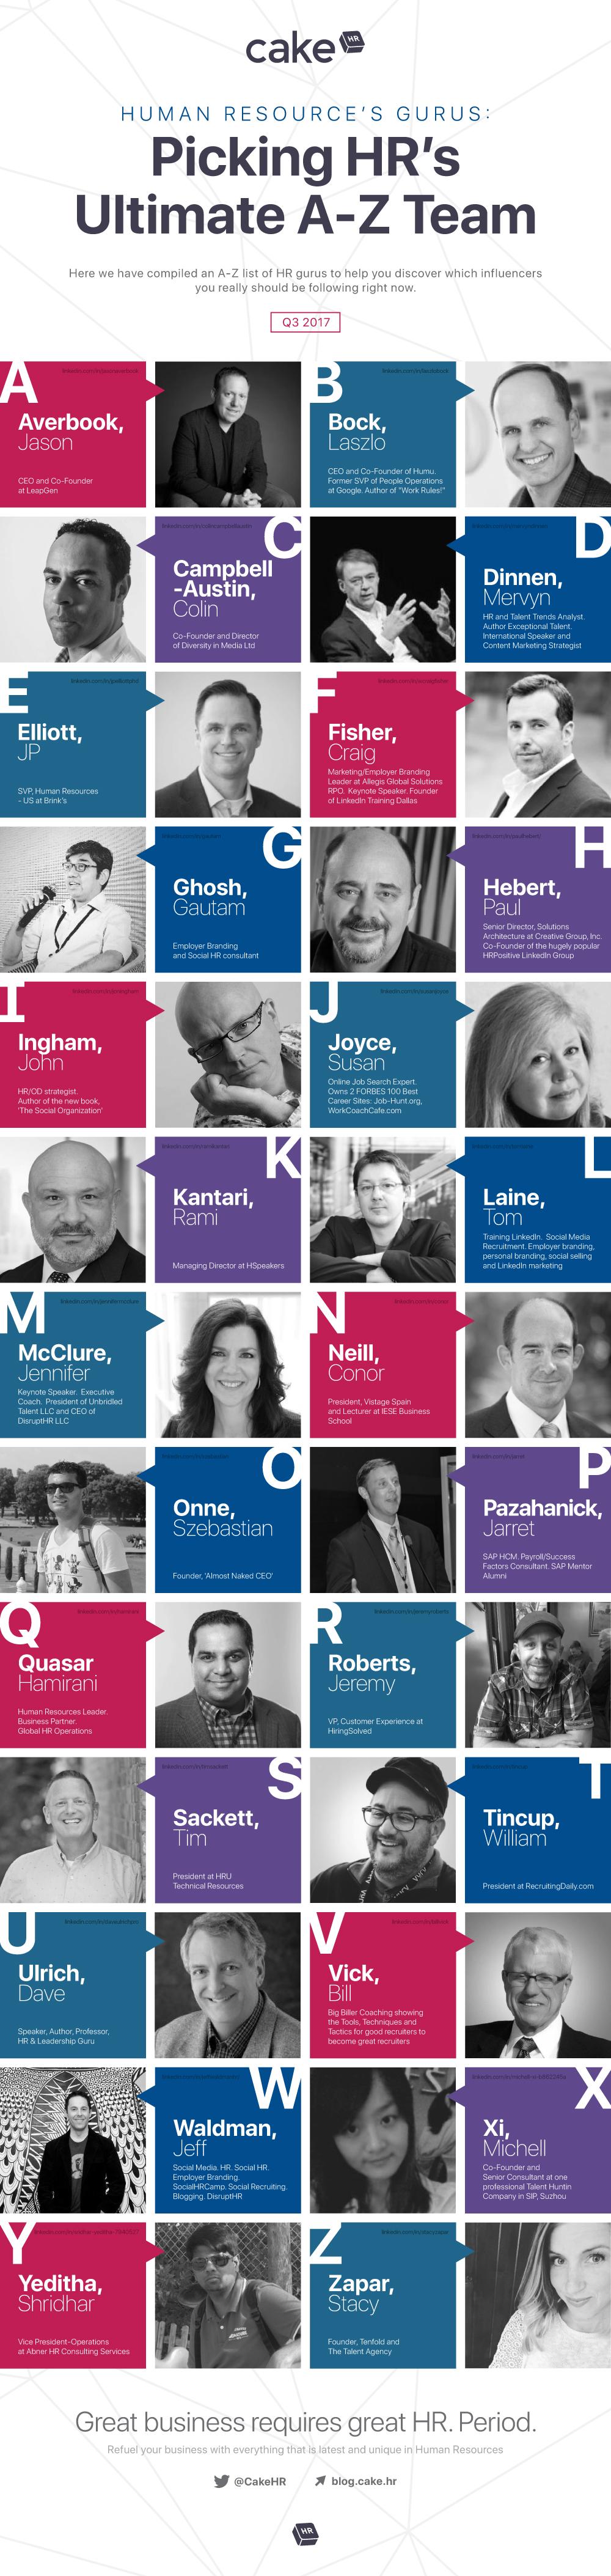 Human Resources Guru's: Picking HR's Ultimate A-Z Team